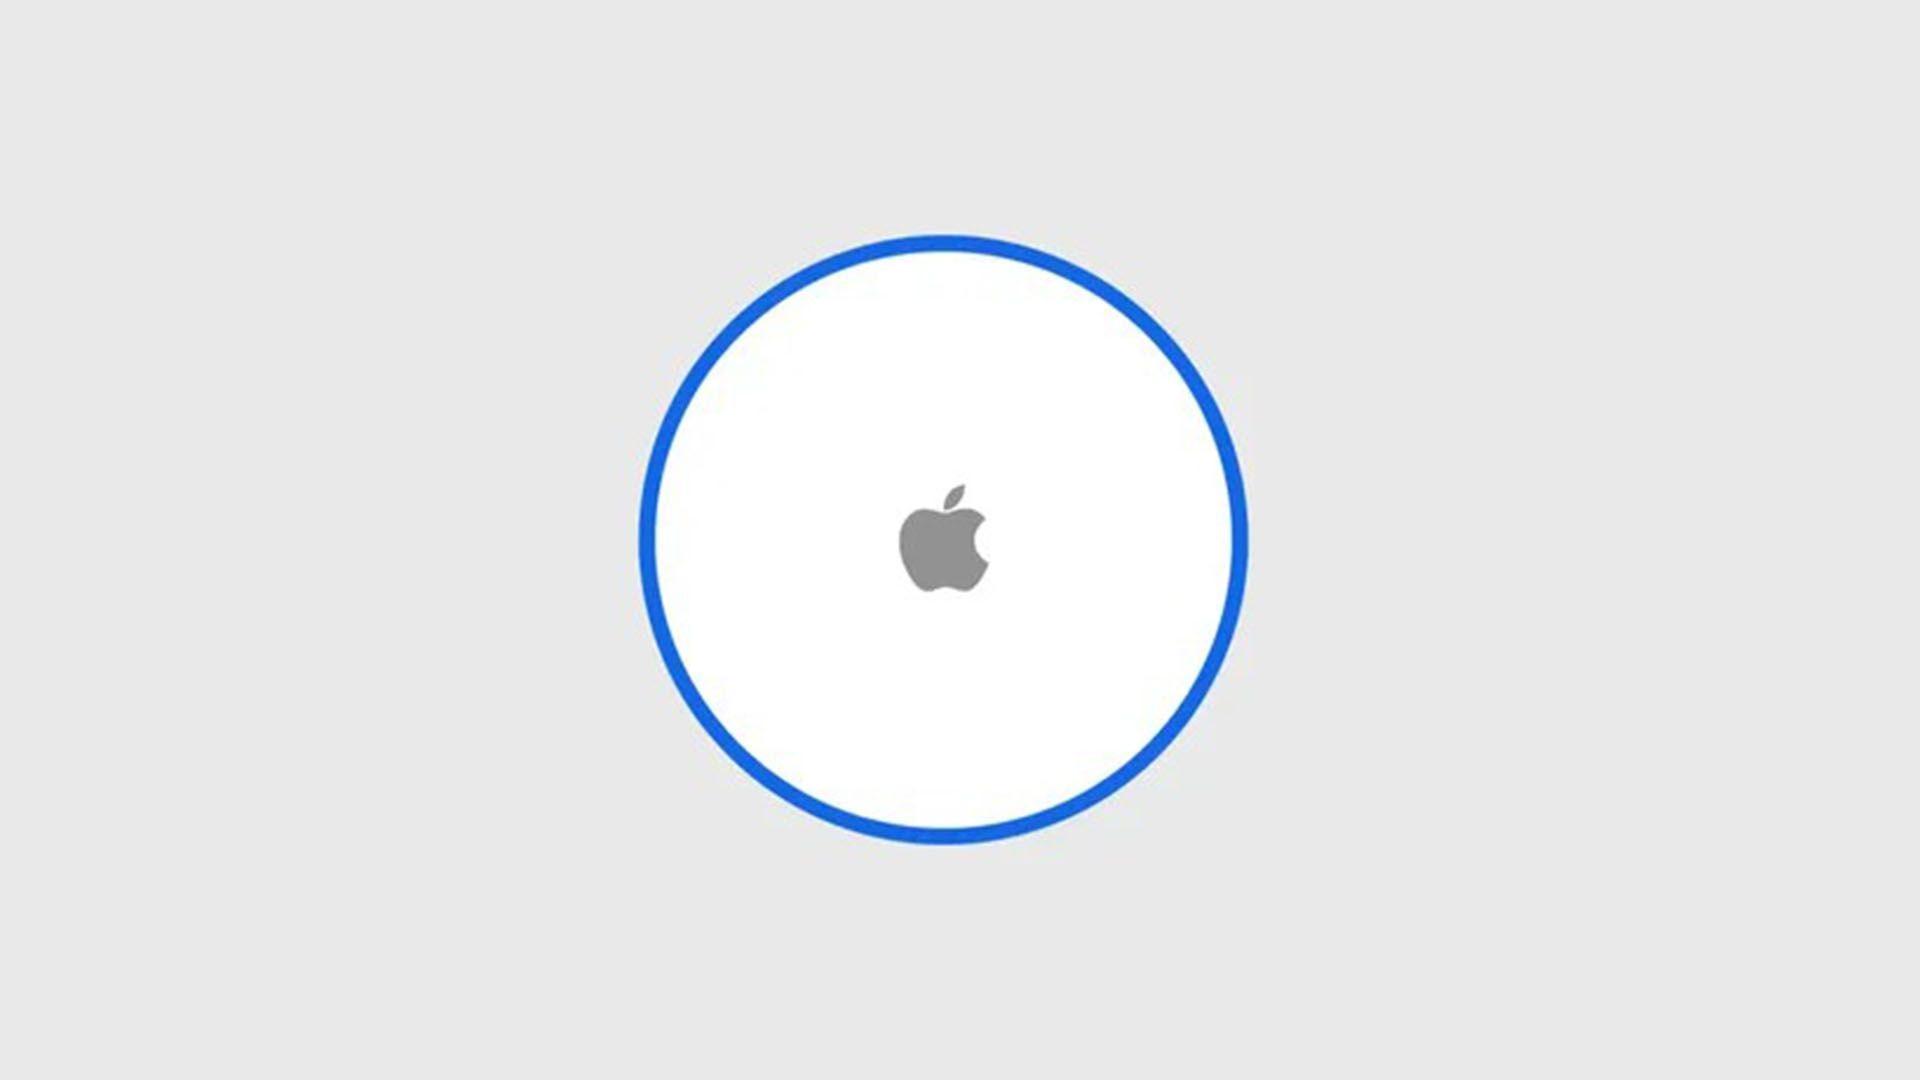 Spring Loaded evento de Apple